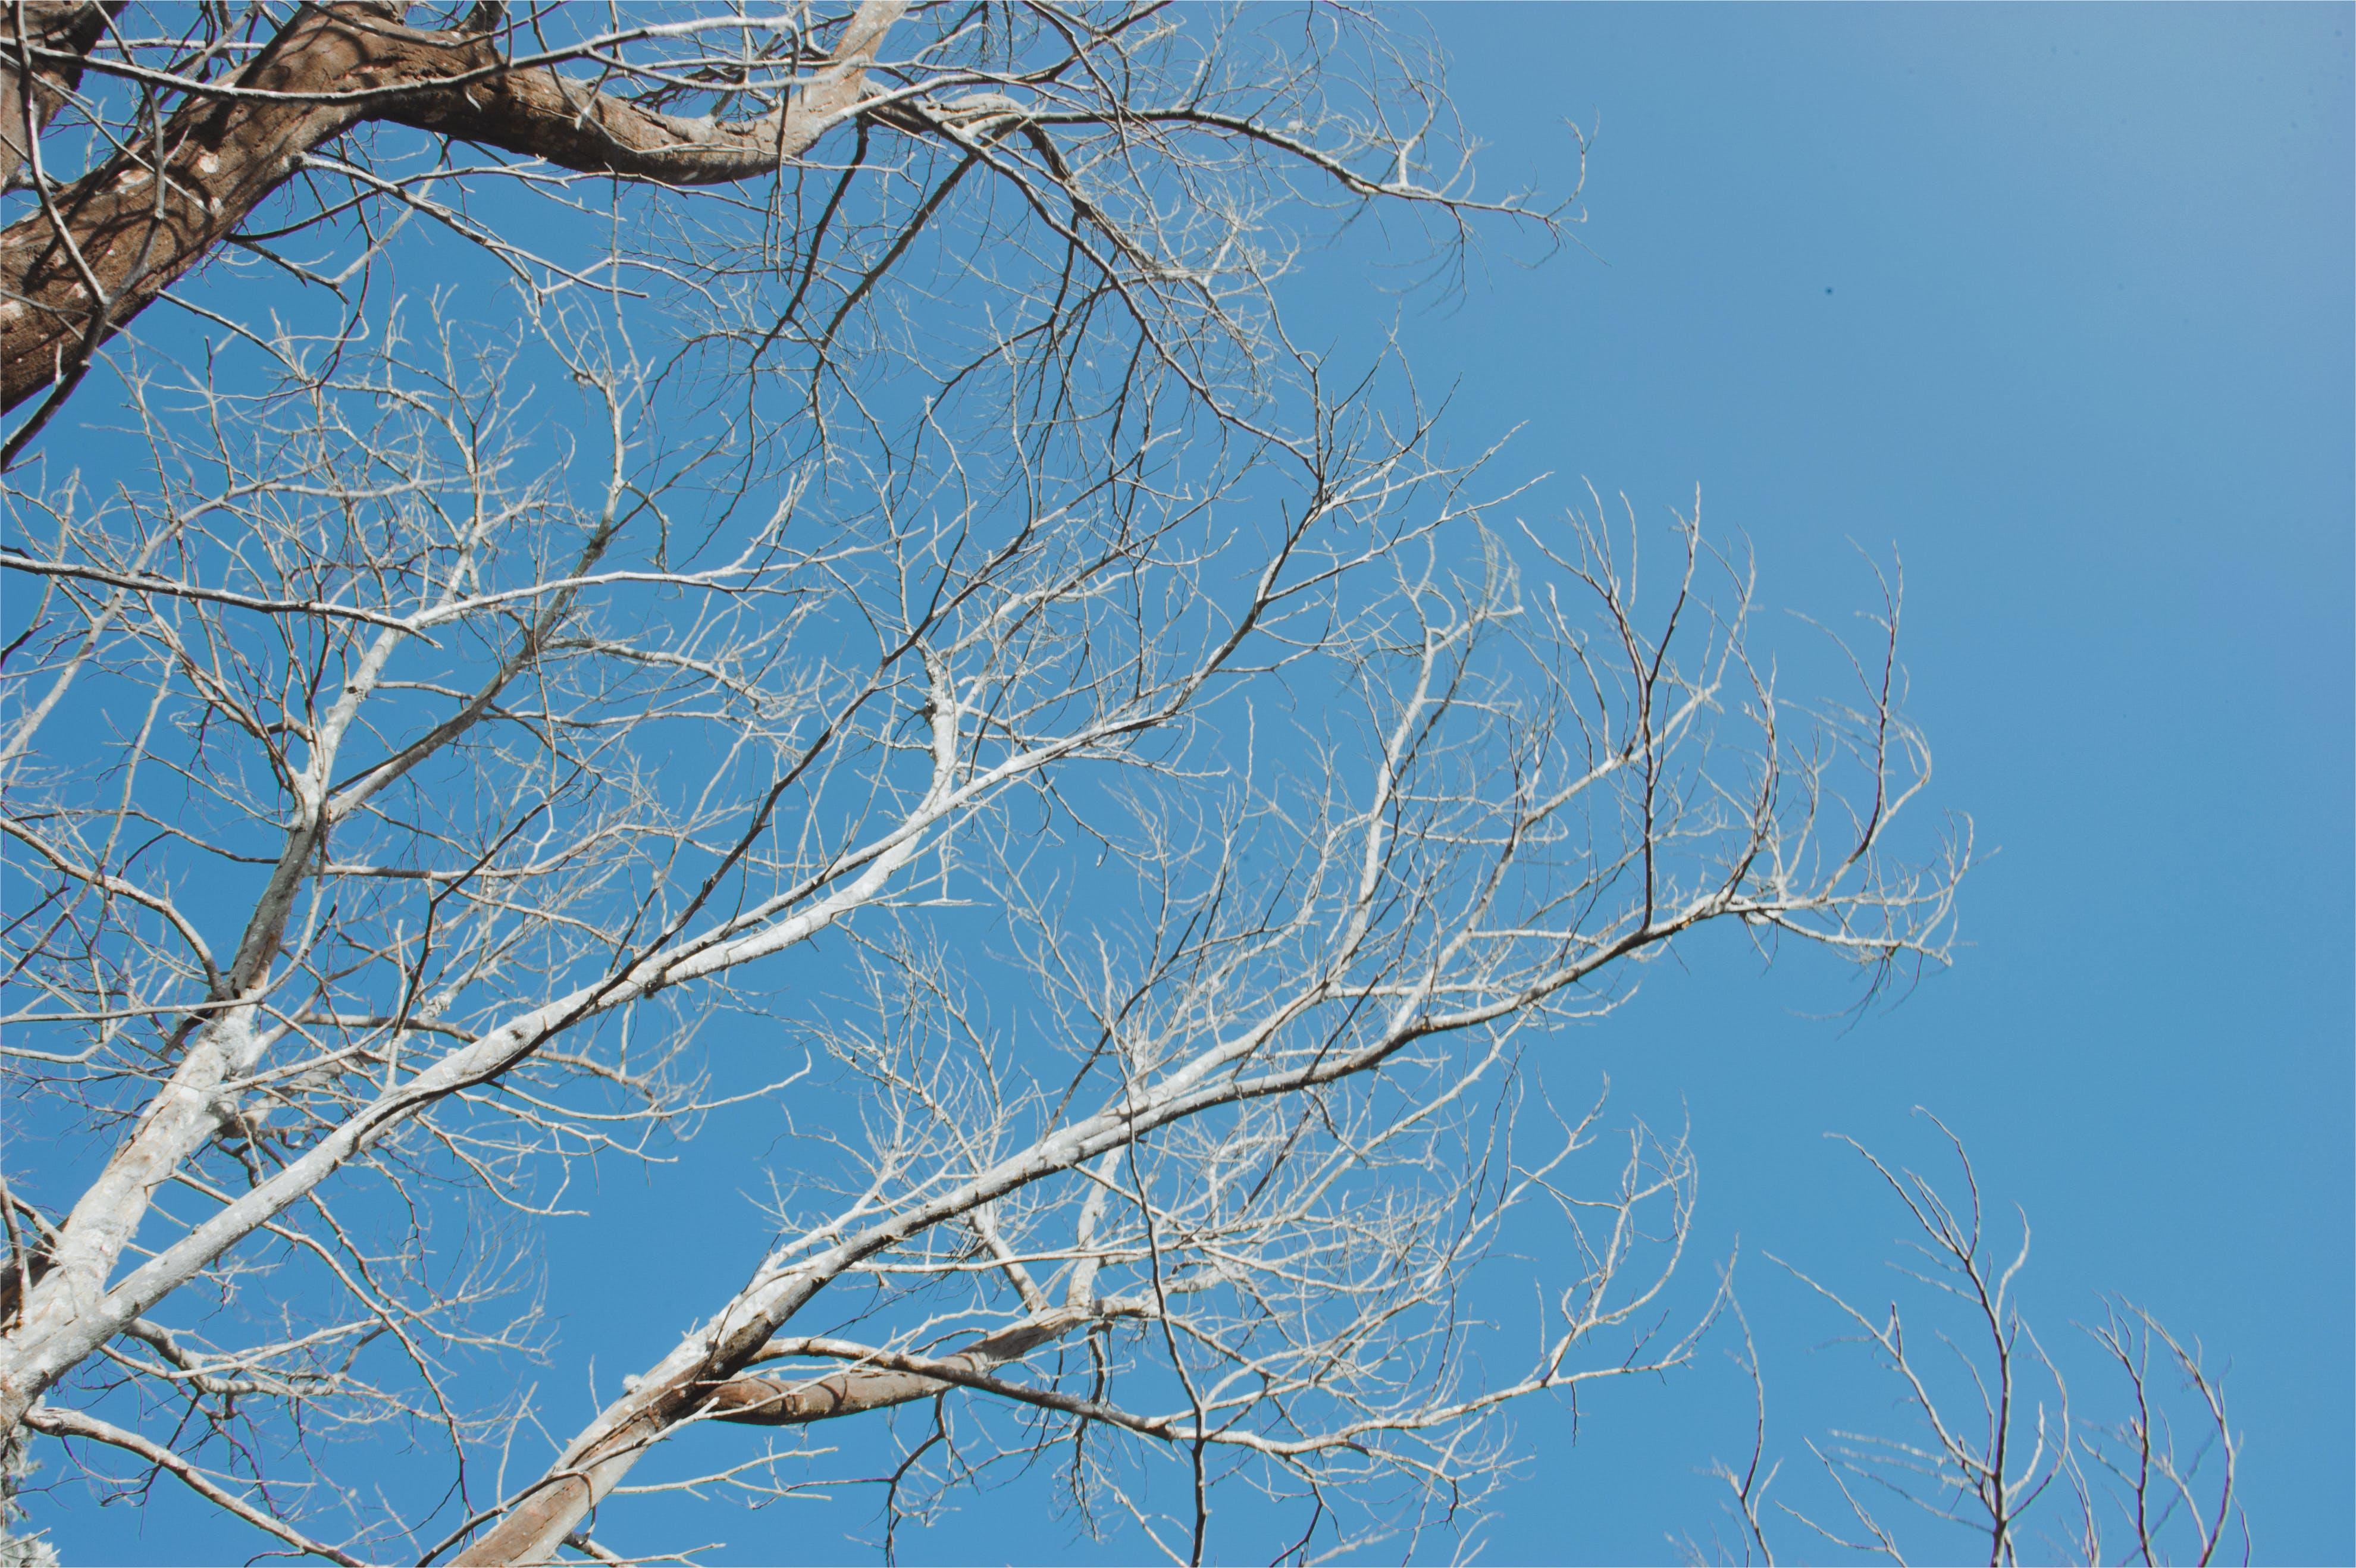 Bared Tree Under Blue Sky